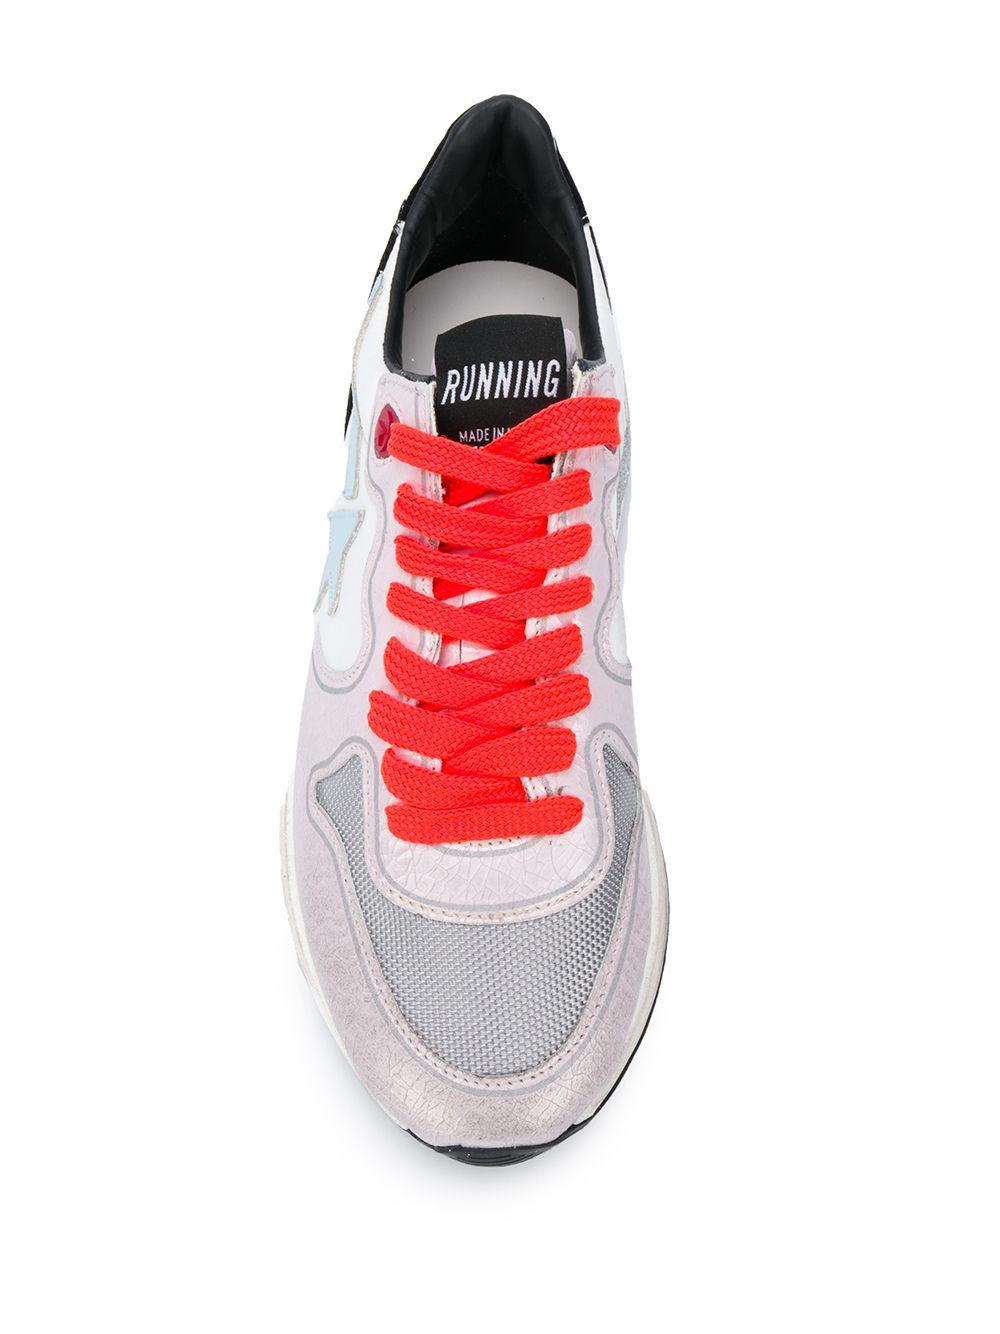 Picture of Golden Goose Deluxe Brand | Running Sole Low-Top Sneakers